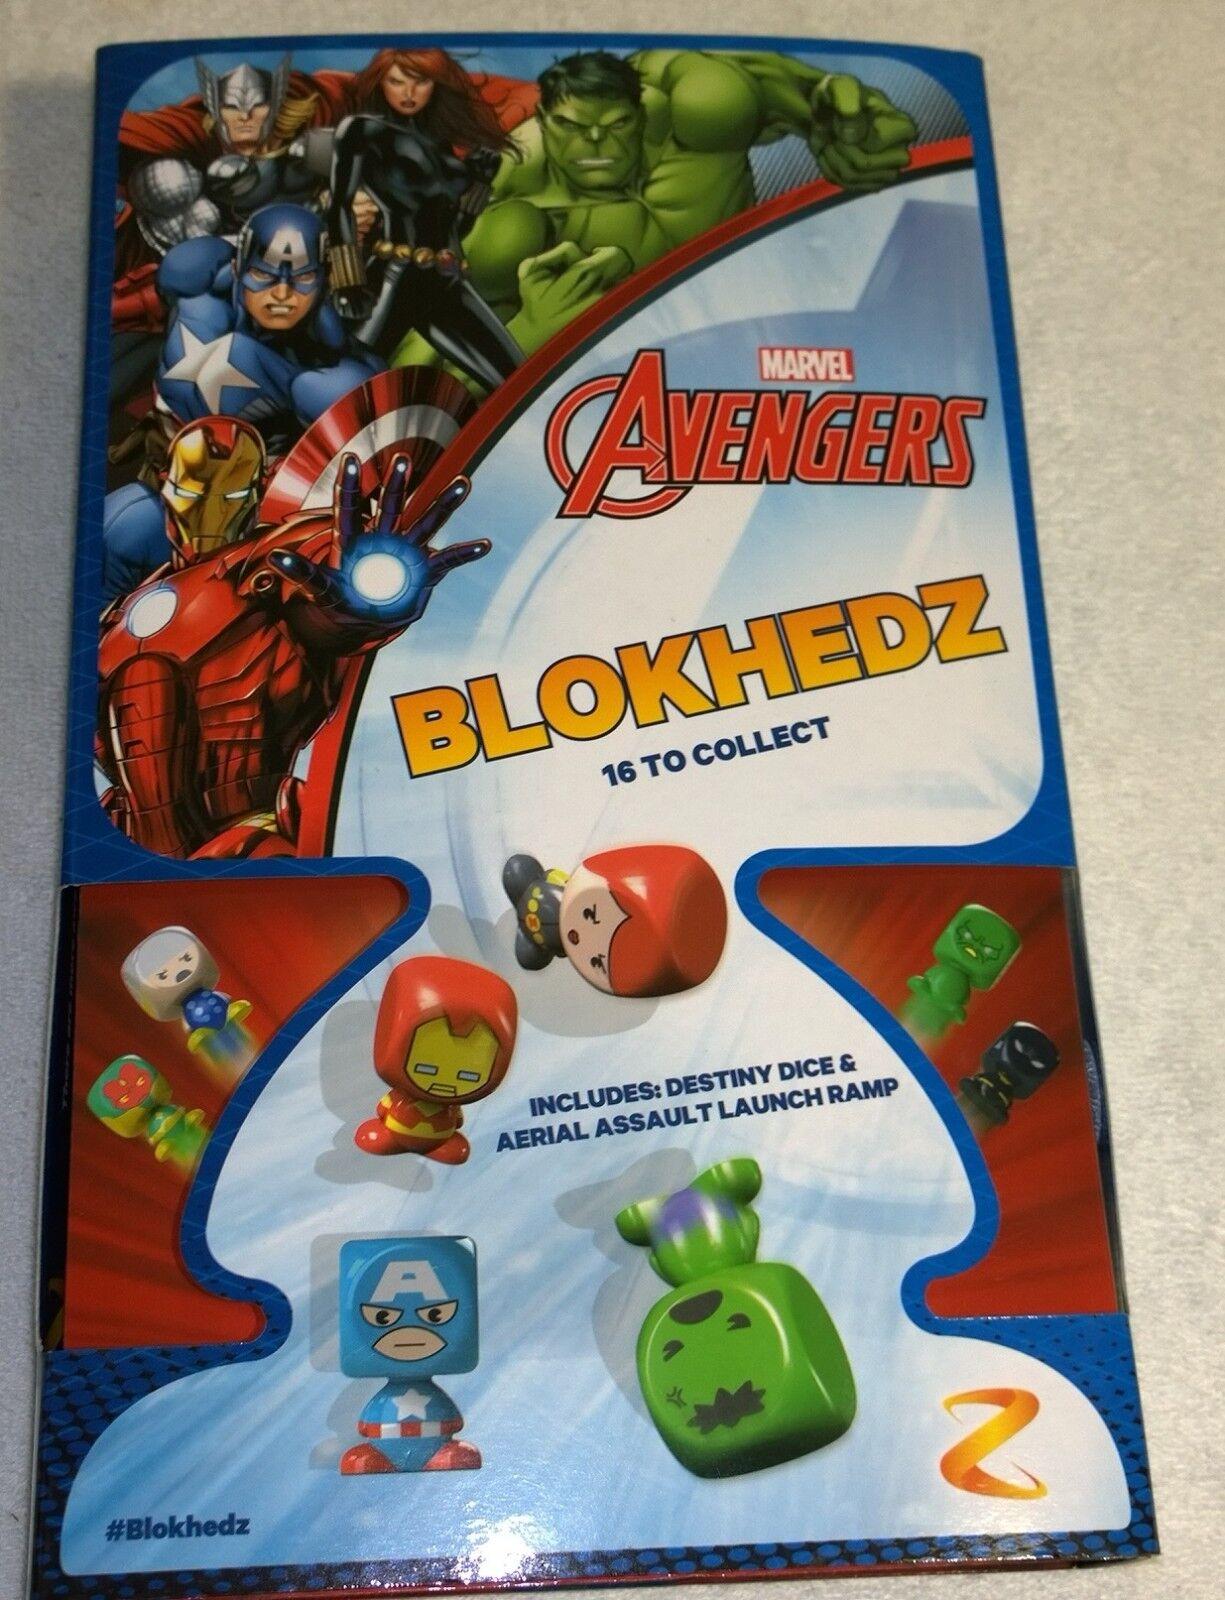 Nz ausgabe marvel avengers 16x minifigures +  thor  iron man  ultron vision